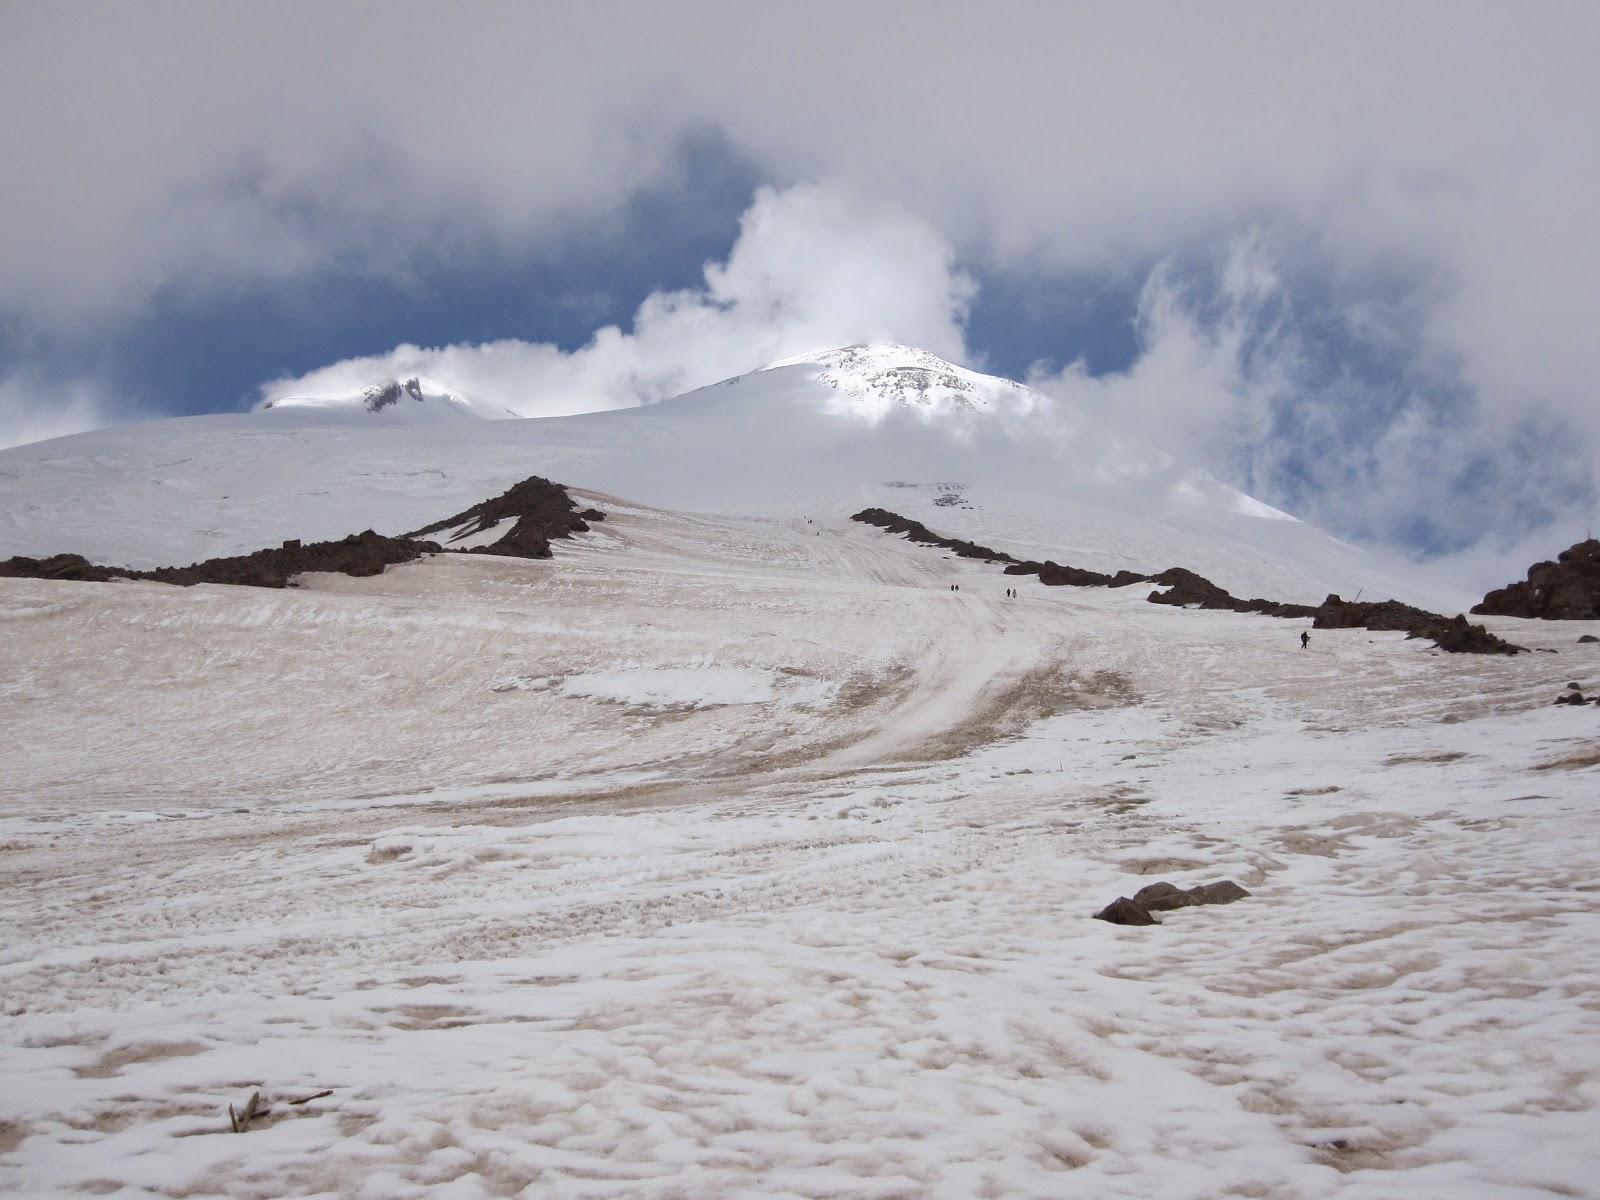 Pastukhov rocks on Mount Elbrus